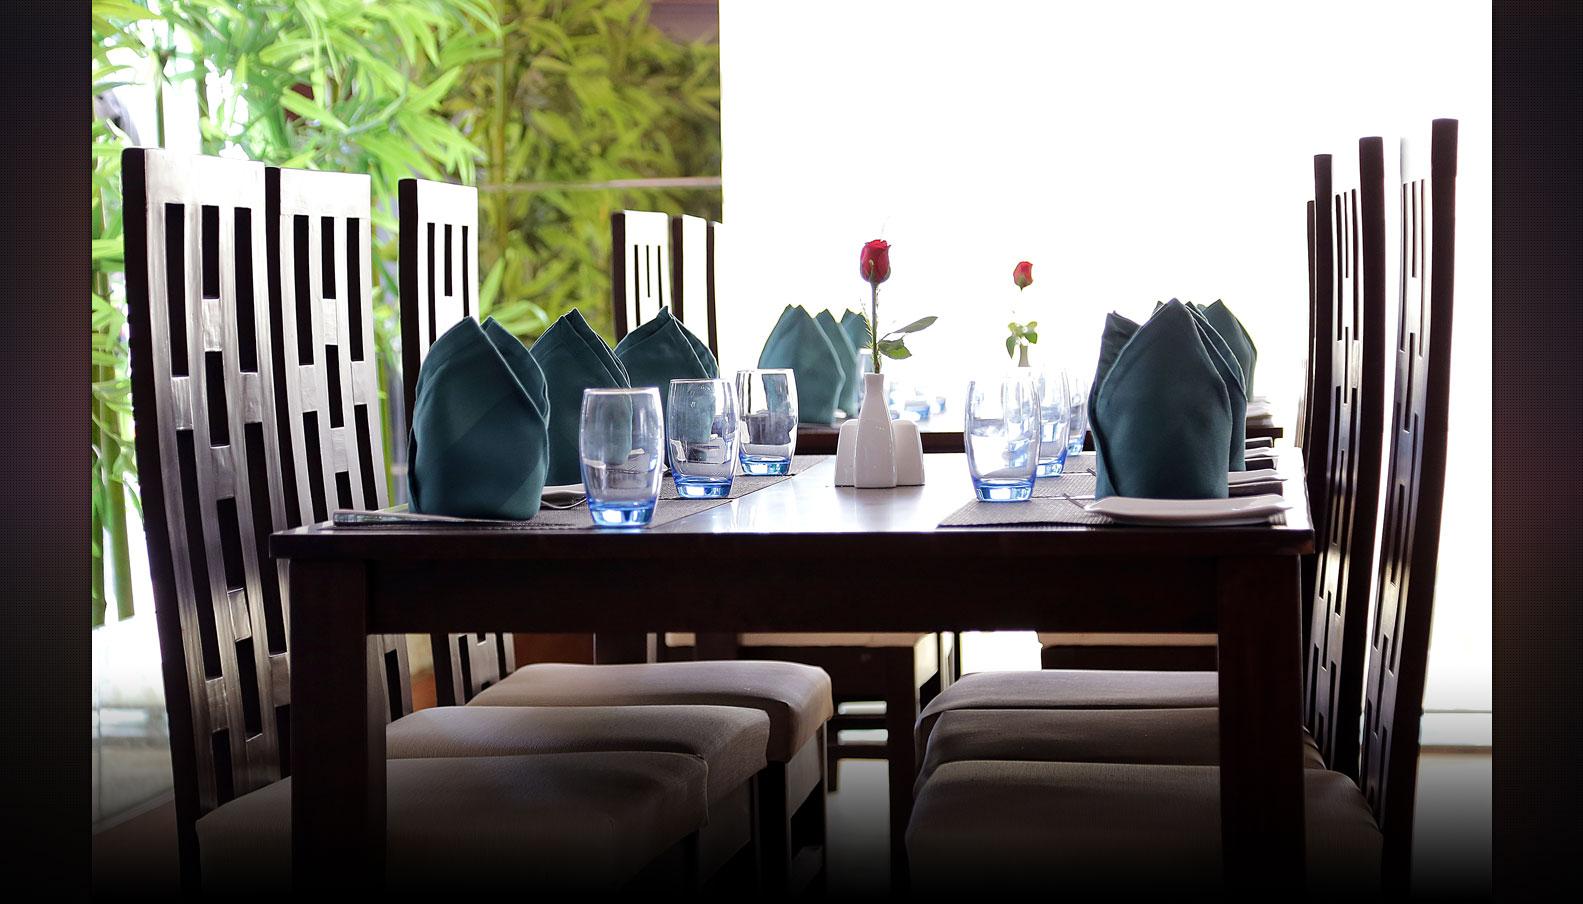 Ethnotel Hotel Multi-cuisine Restaurant